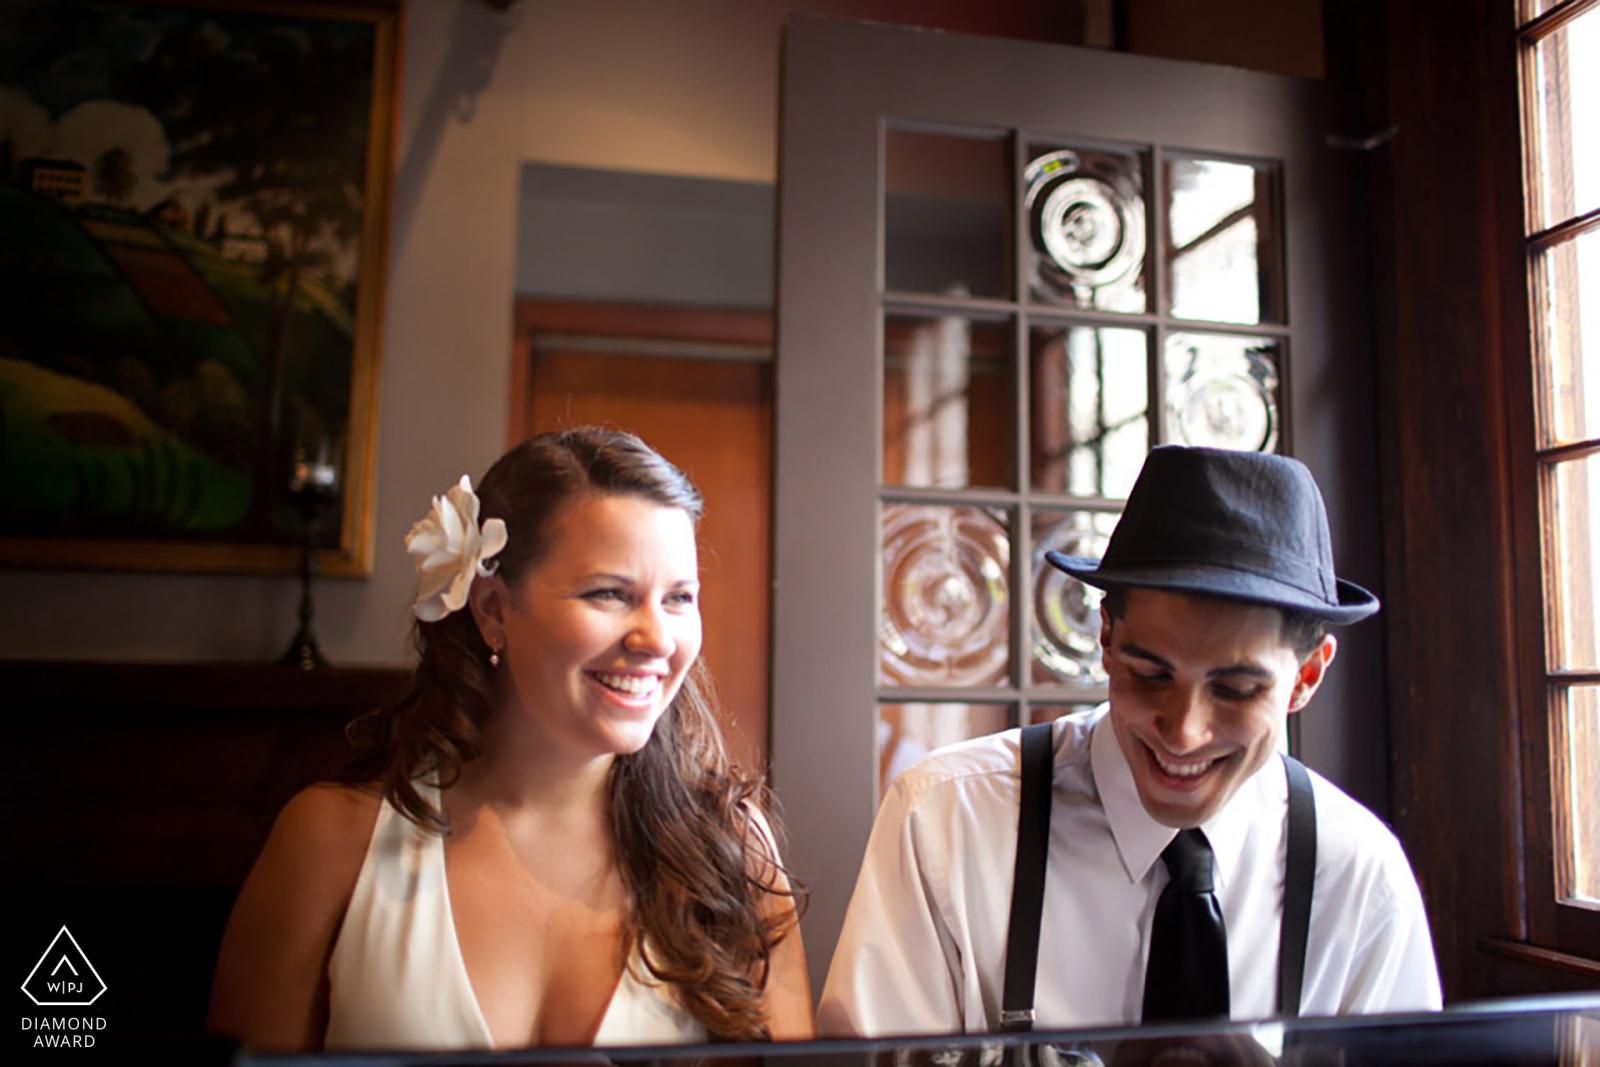 jazzy engagement love award winning engagement photo by casey fatchett